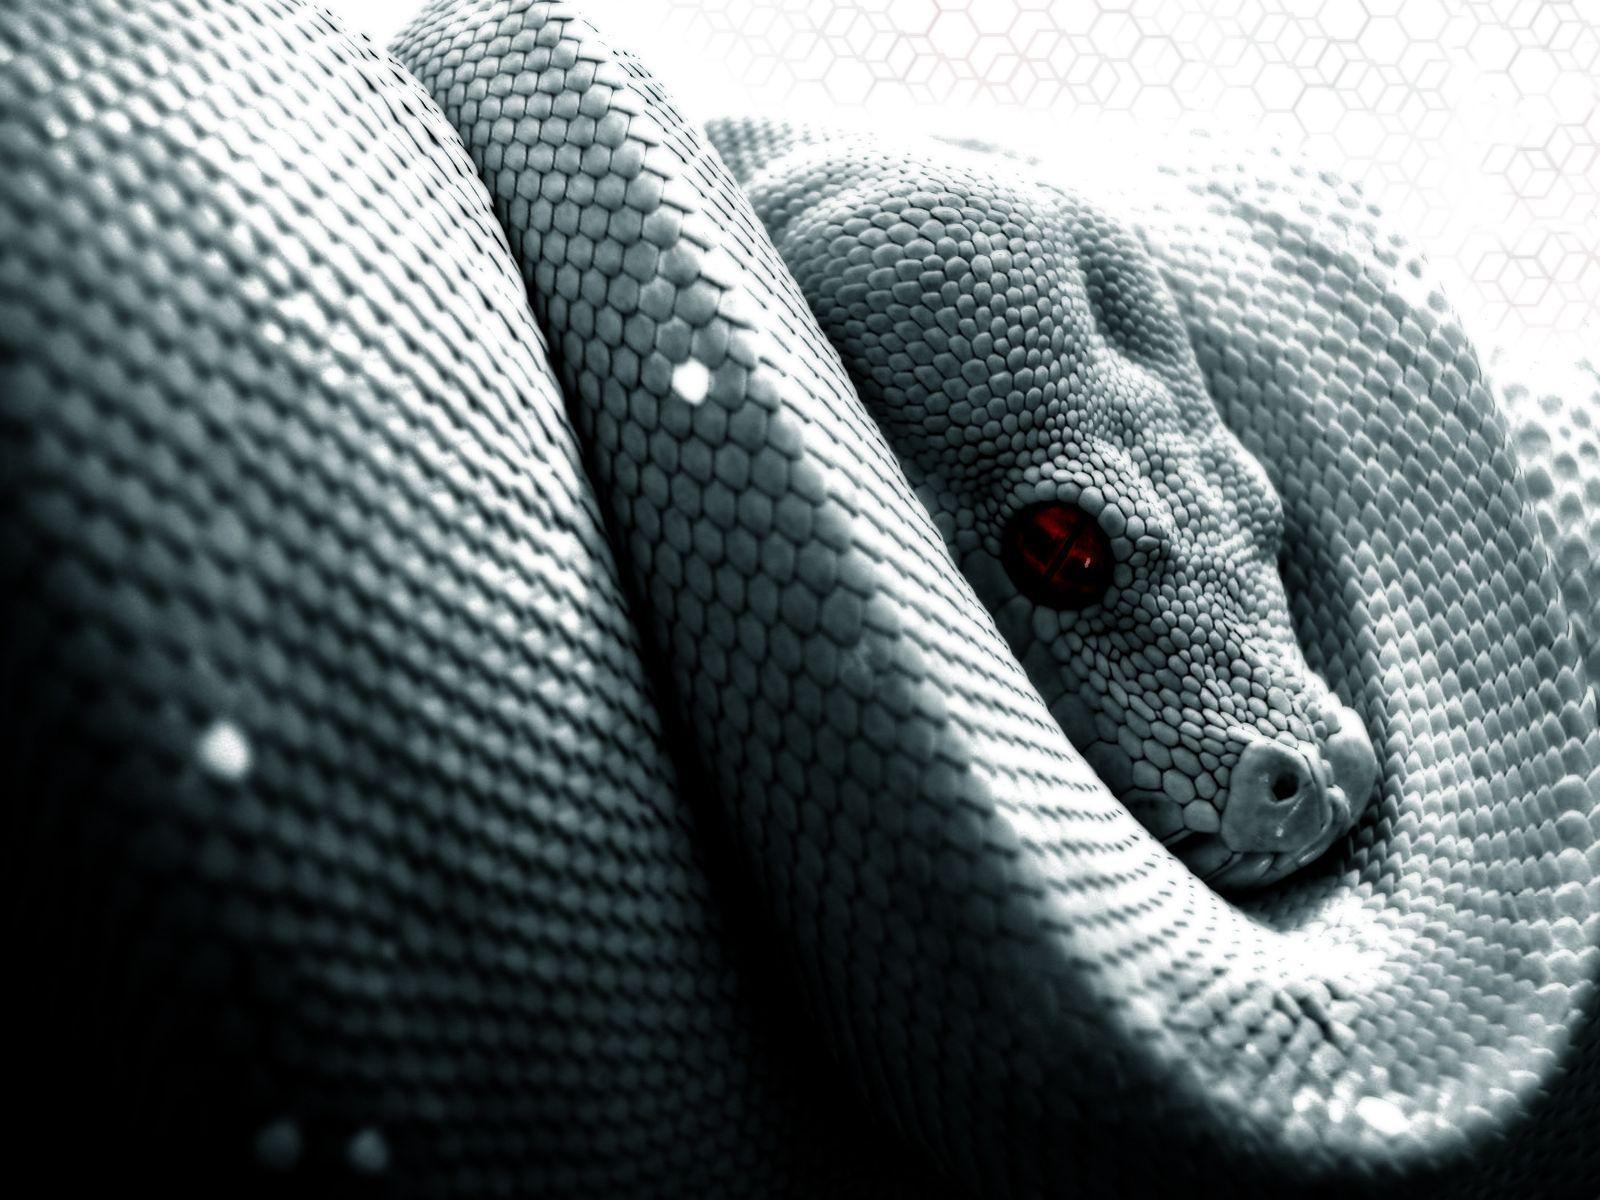 Snake Computer Wallpapers, Desktop Backgrounds 1600x1200 Id: 26823